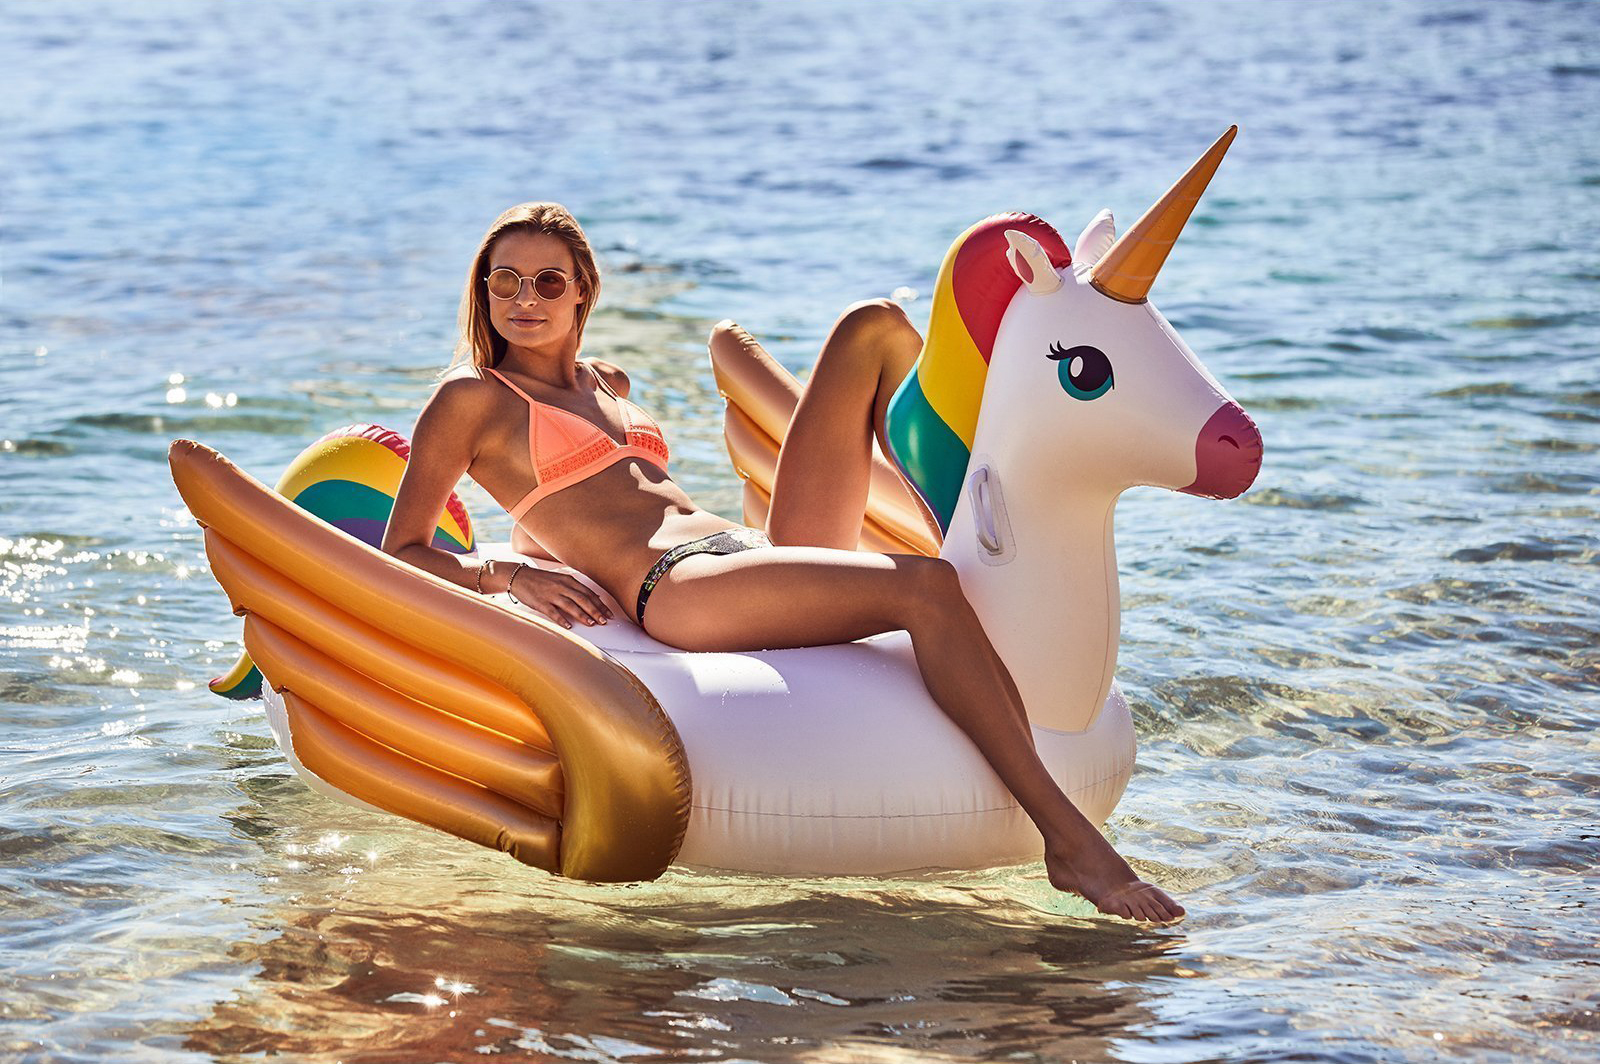 S8LRIDUN_ride-on-float-unicorn_3_1d8147a4-9b46-40ee-b503-eff14e757130.jpg